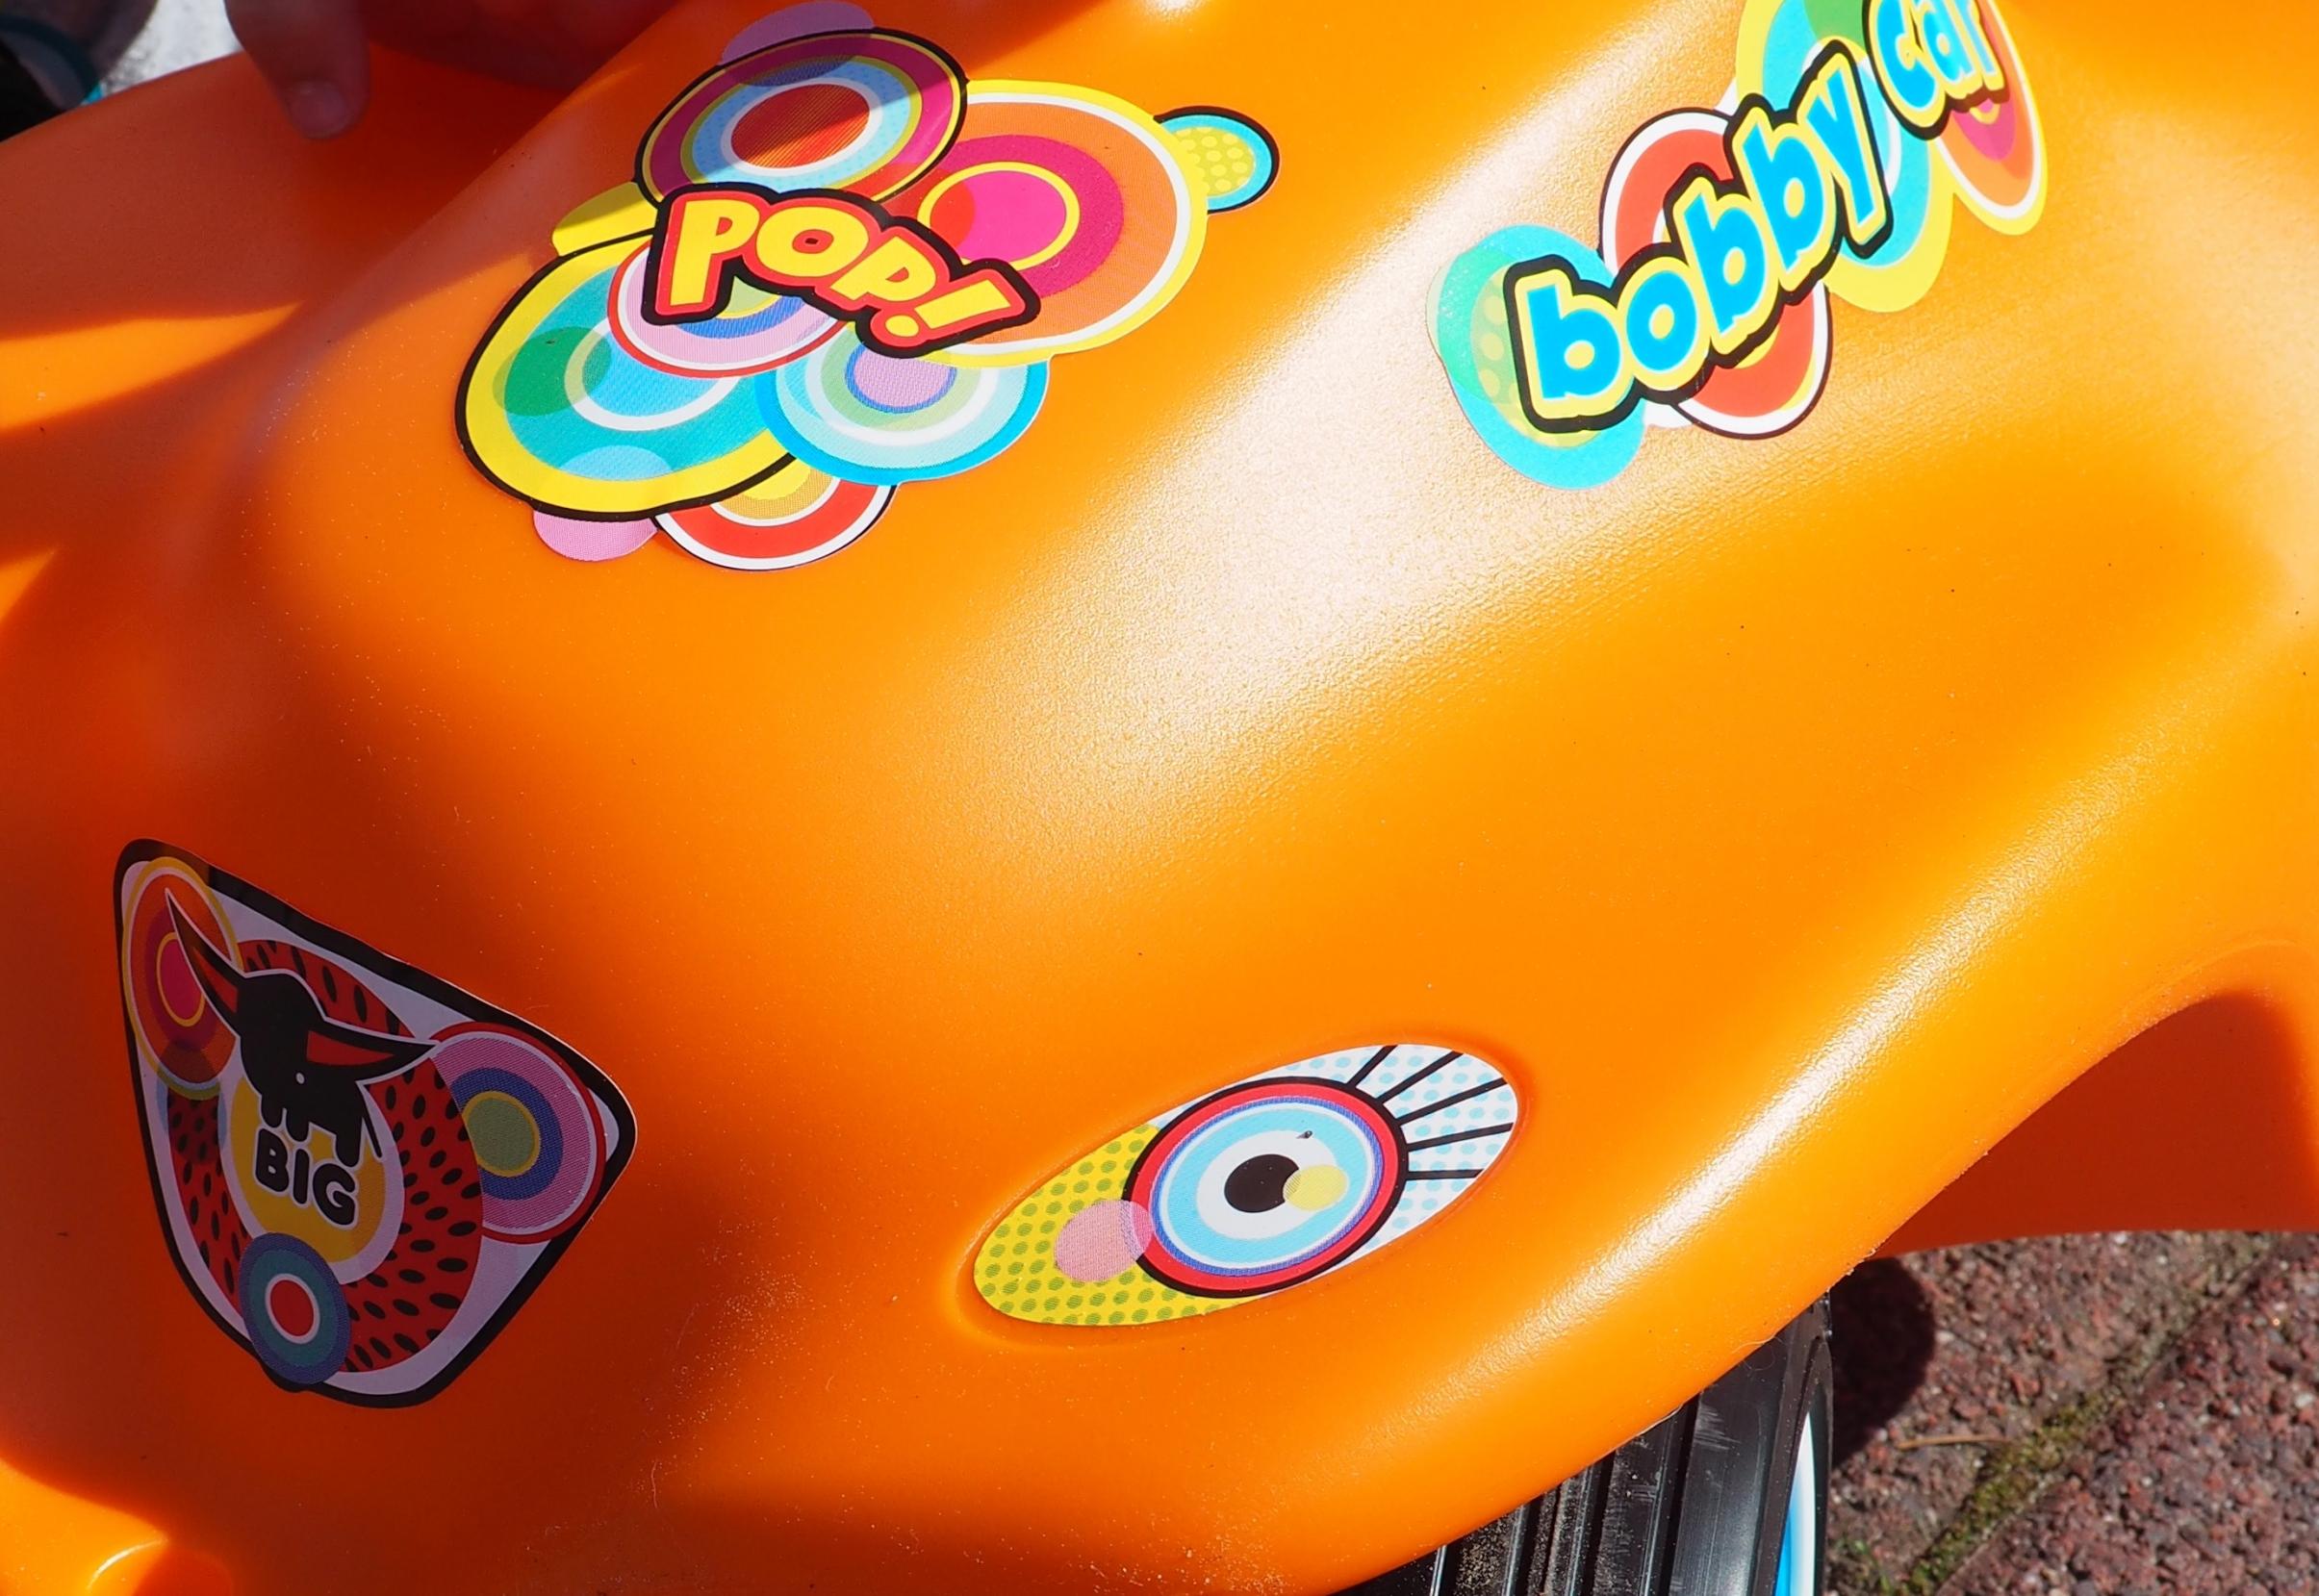 Das New Bobby Car Pop im Test bei SarDoe_1